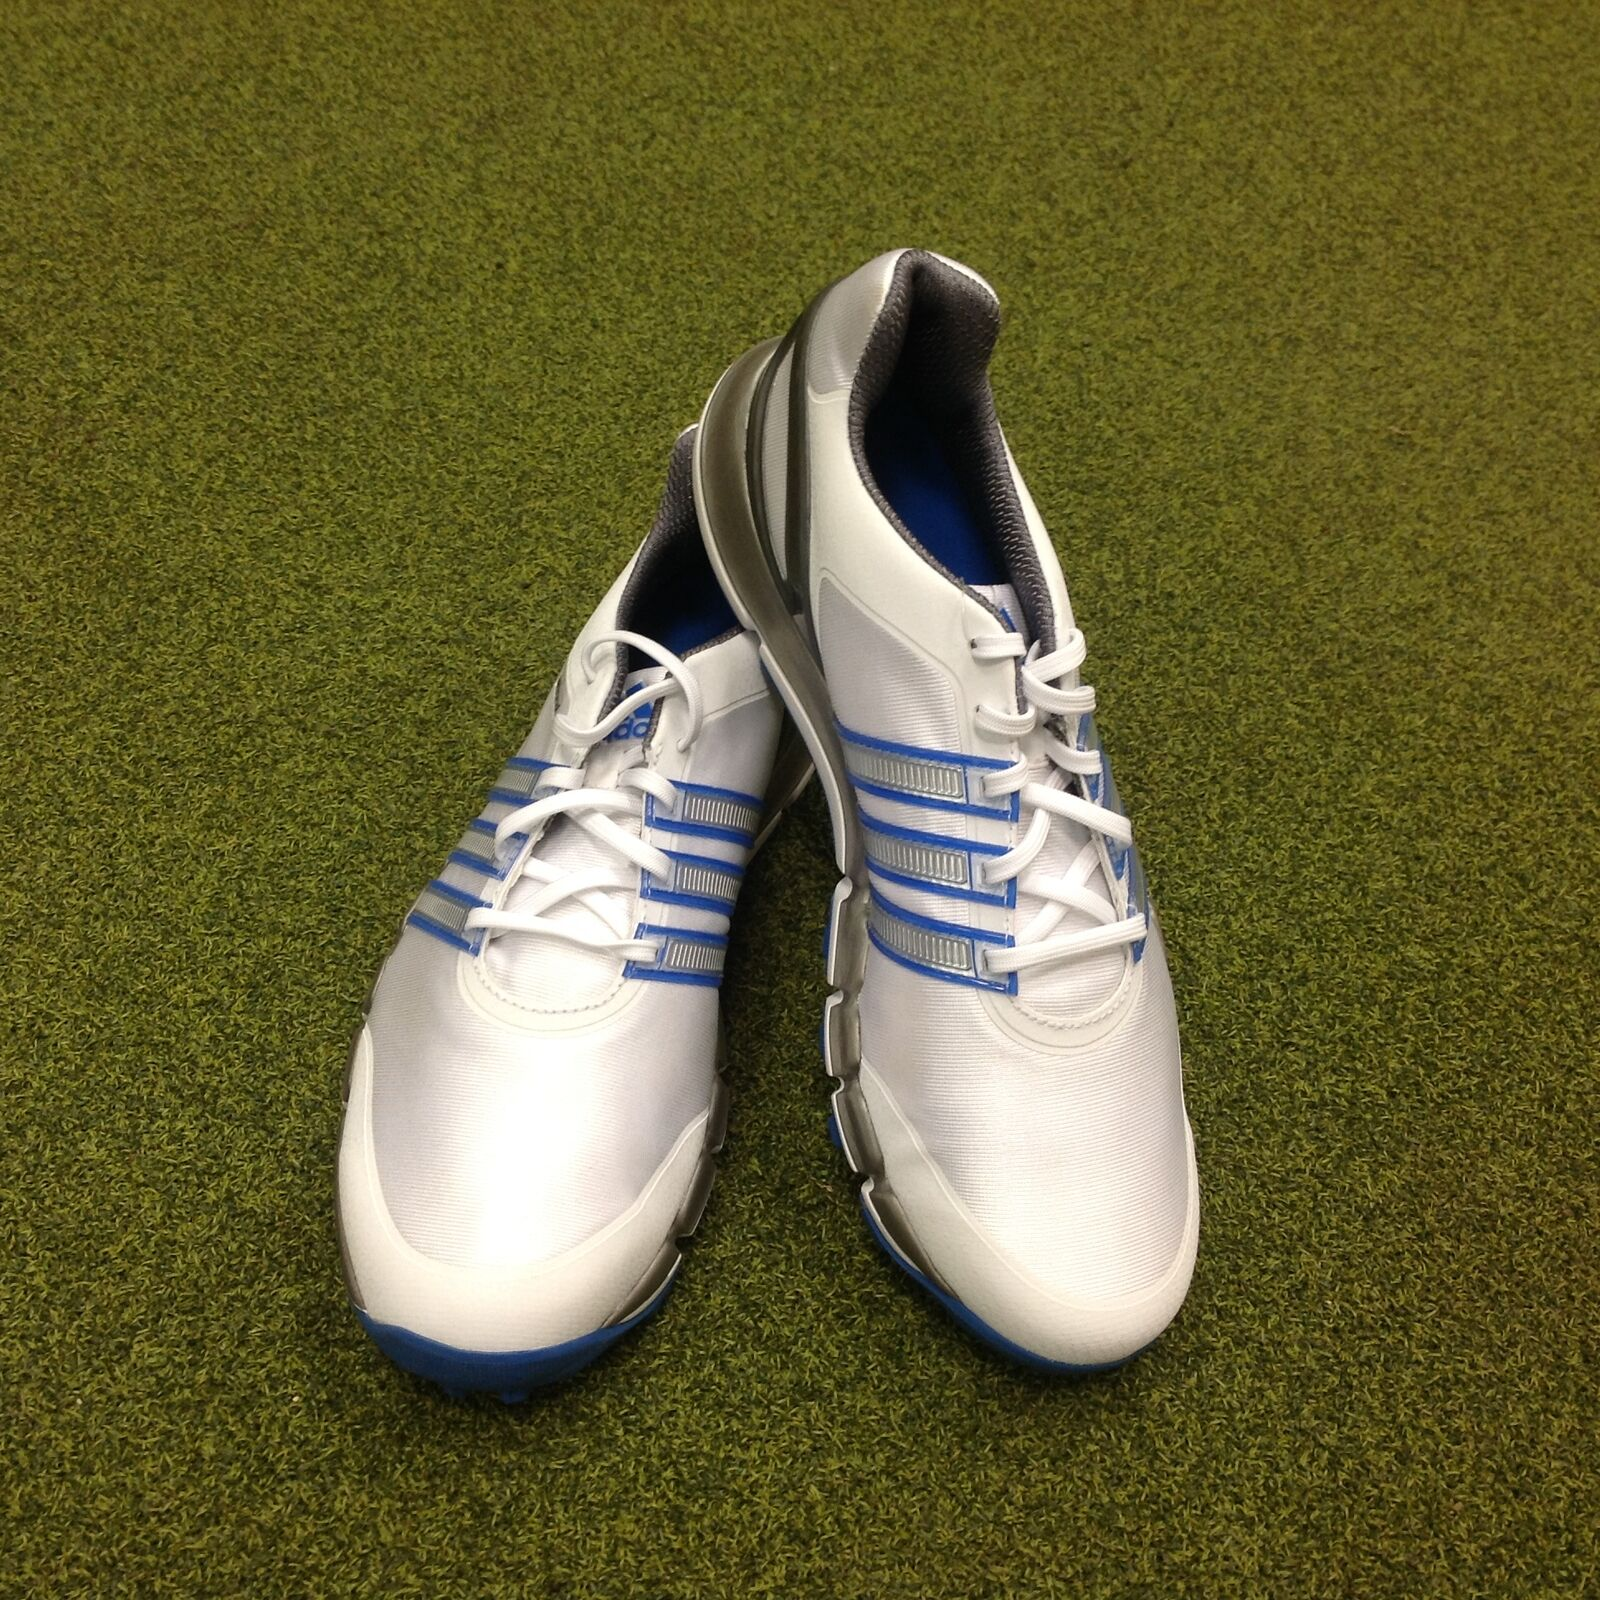 Scarpe casual da uomo NUOVO Adidas 360 Gripmore SPORT Pure Impermeabile Scarpe Da Golf-misure US 9.